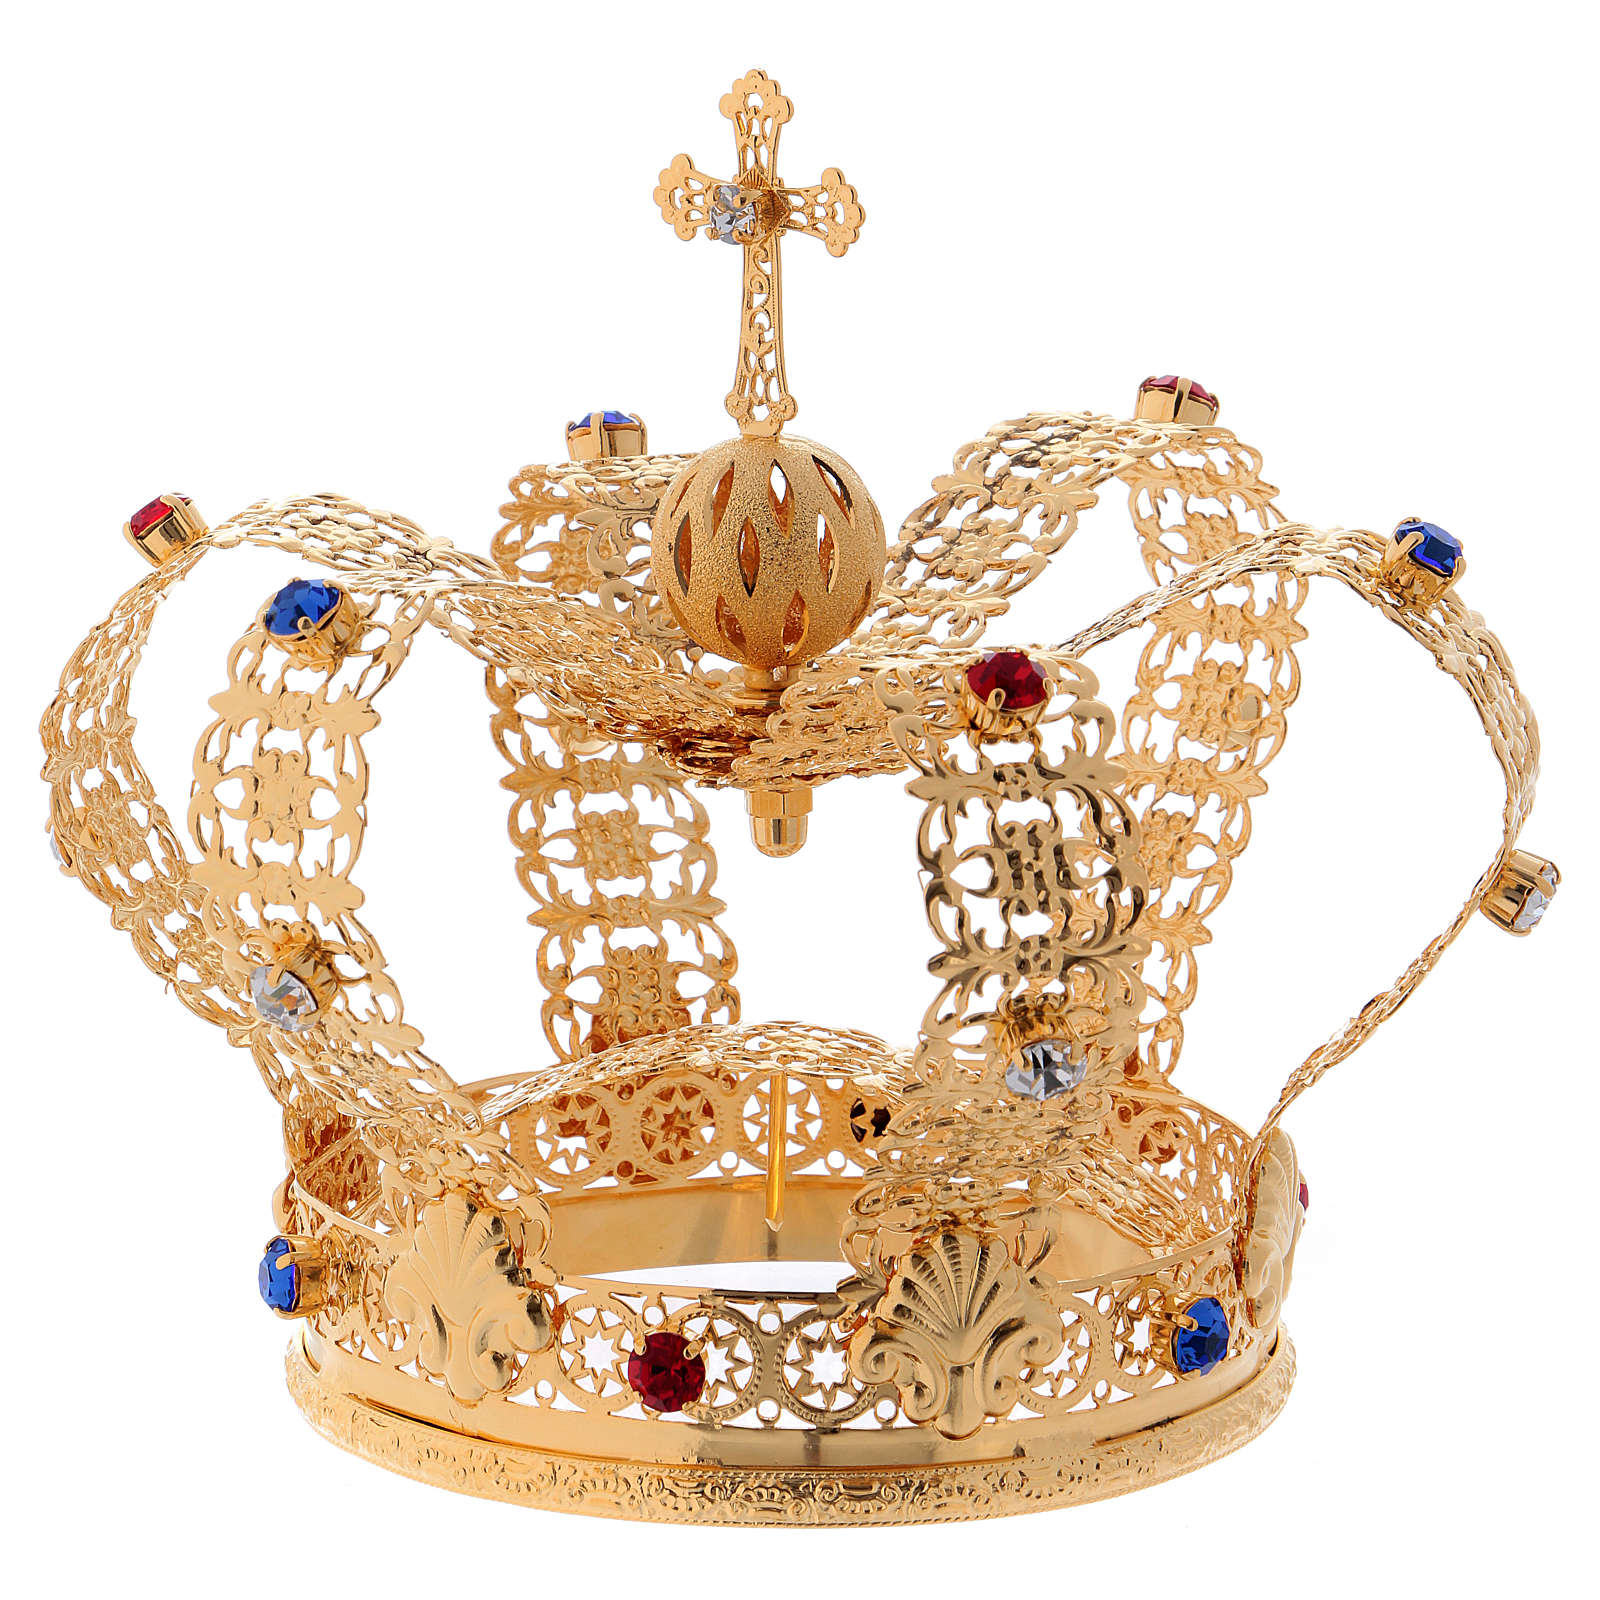 Corona stile imperiale croce e gemme per statue diam. 10 cm 3